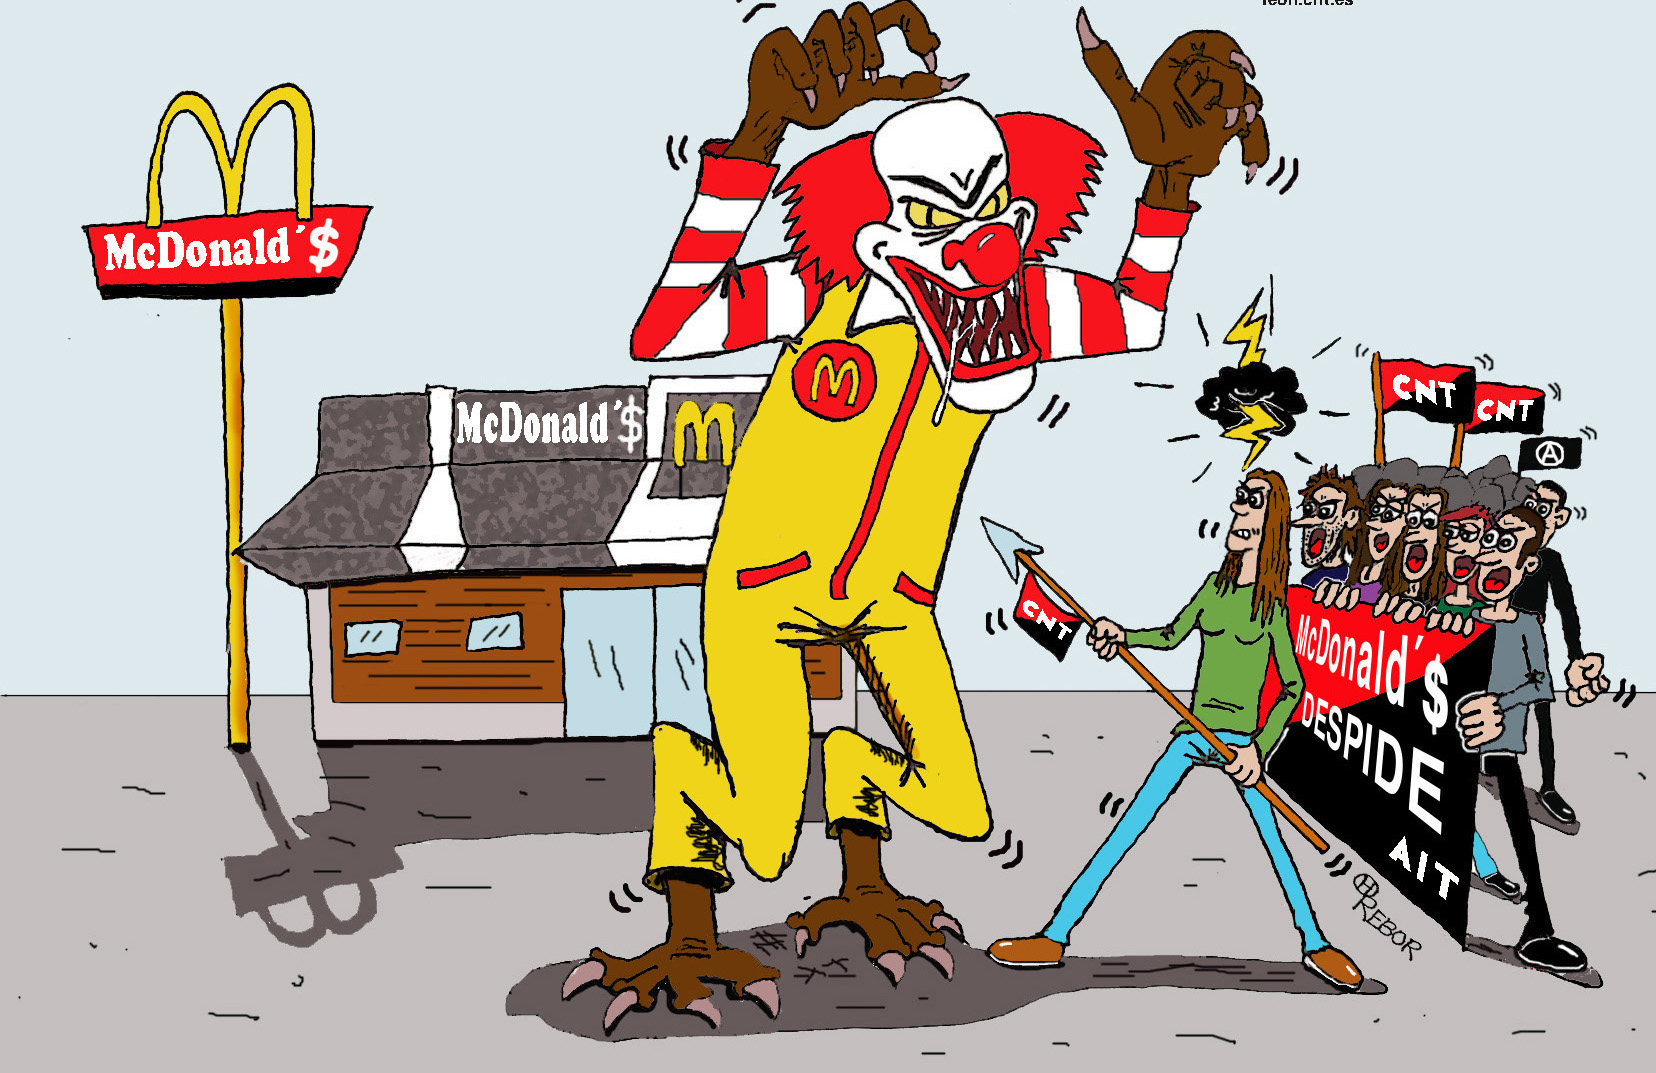 Boicot McDonald's